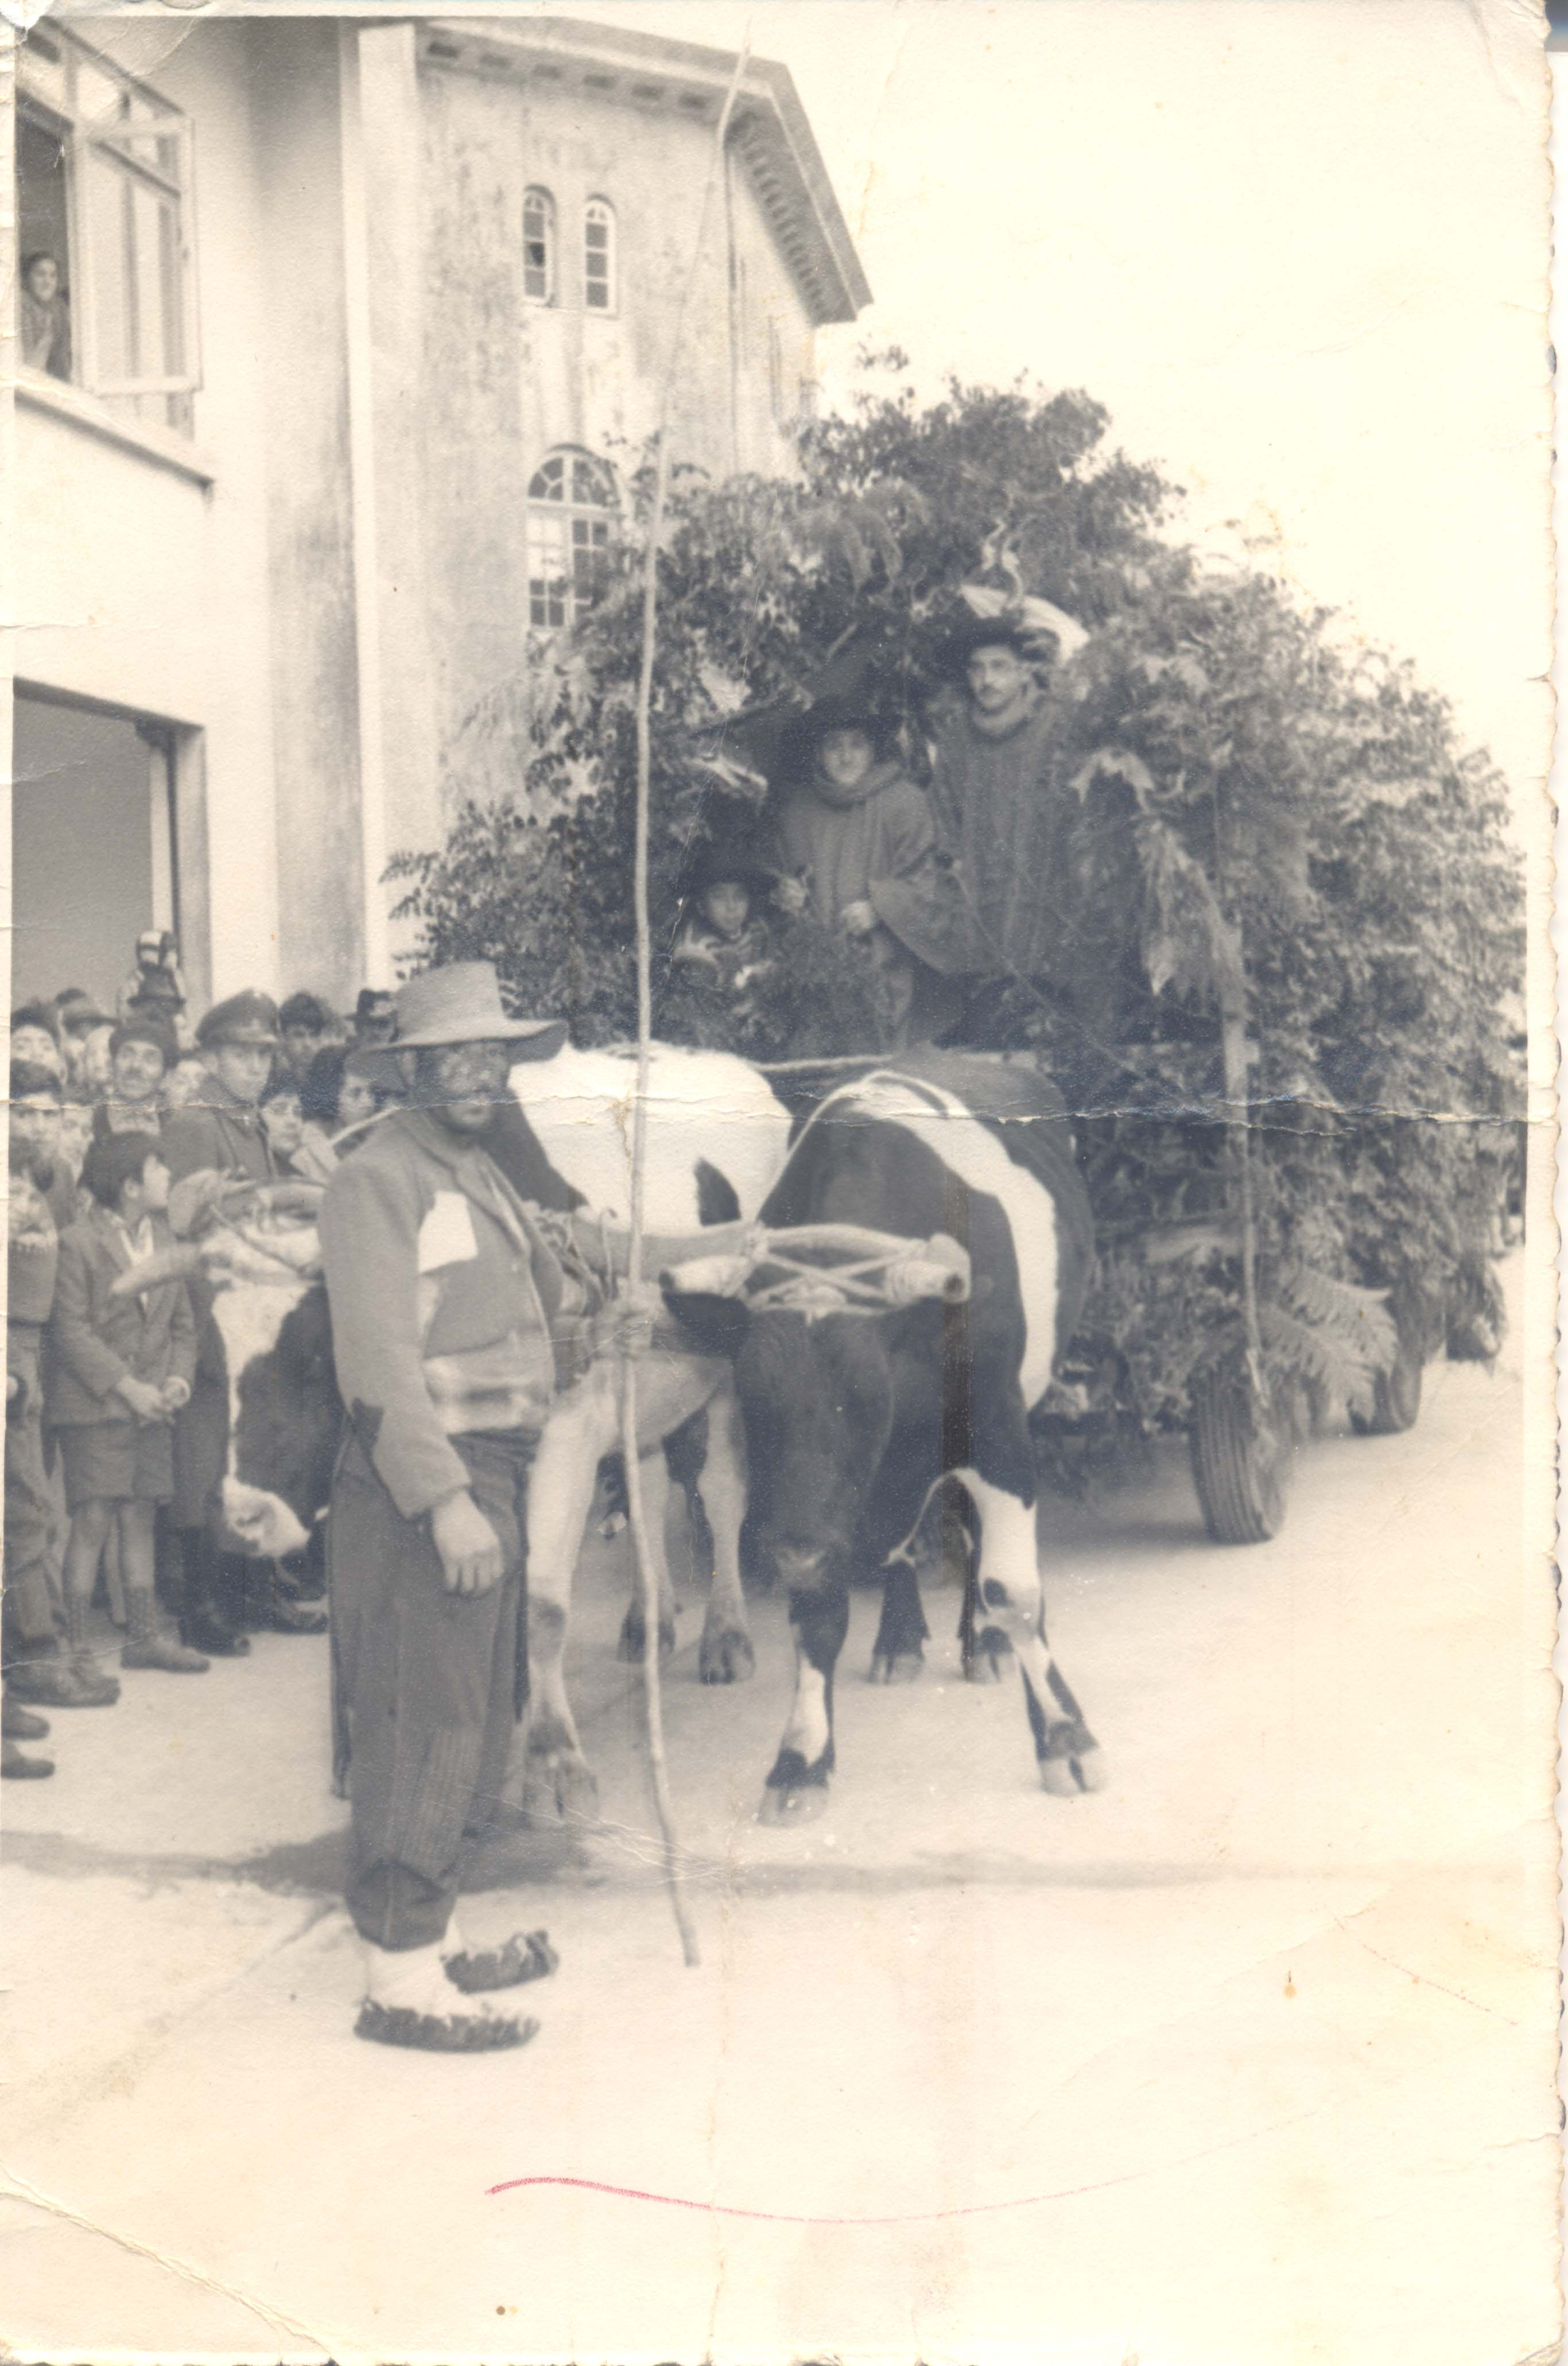 Fiesta de la primavera - Memorias del Siglo XX - Chile - DIBAM